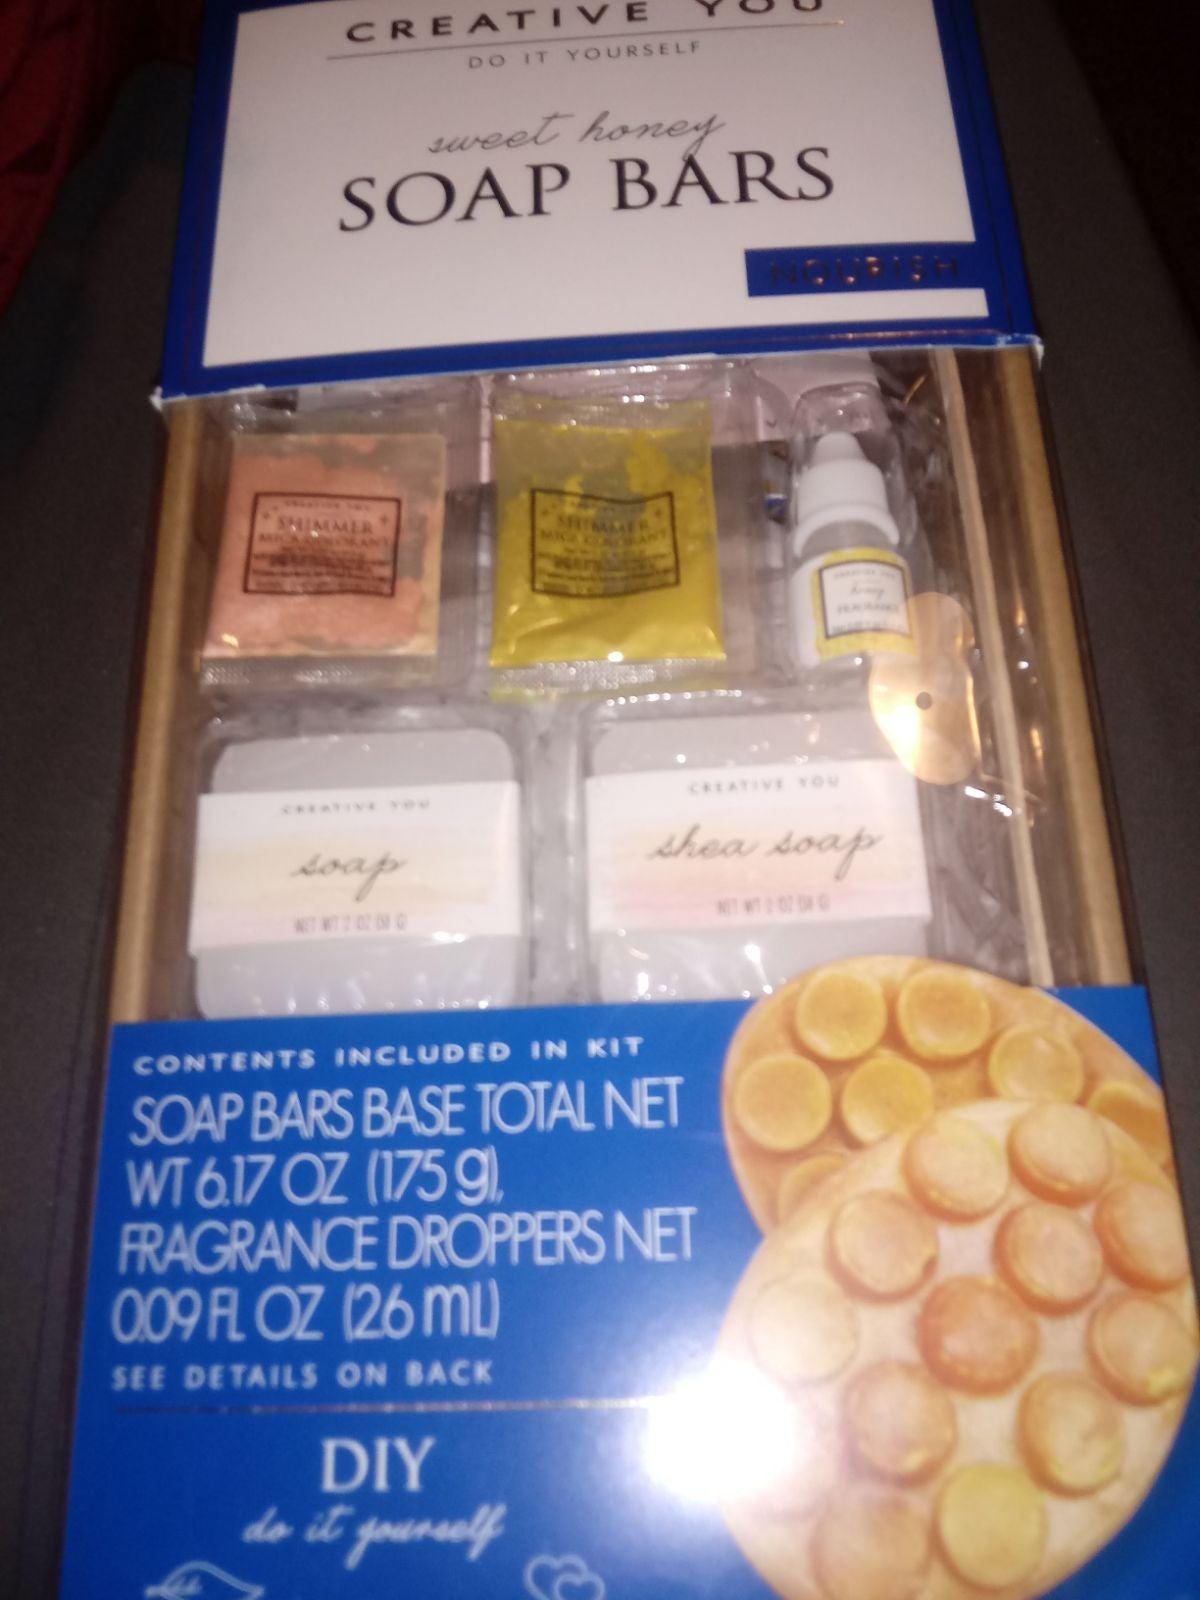 Creative you sweet honey soap bars